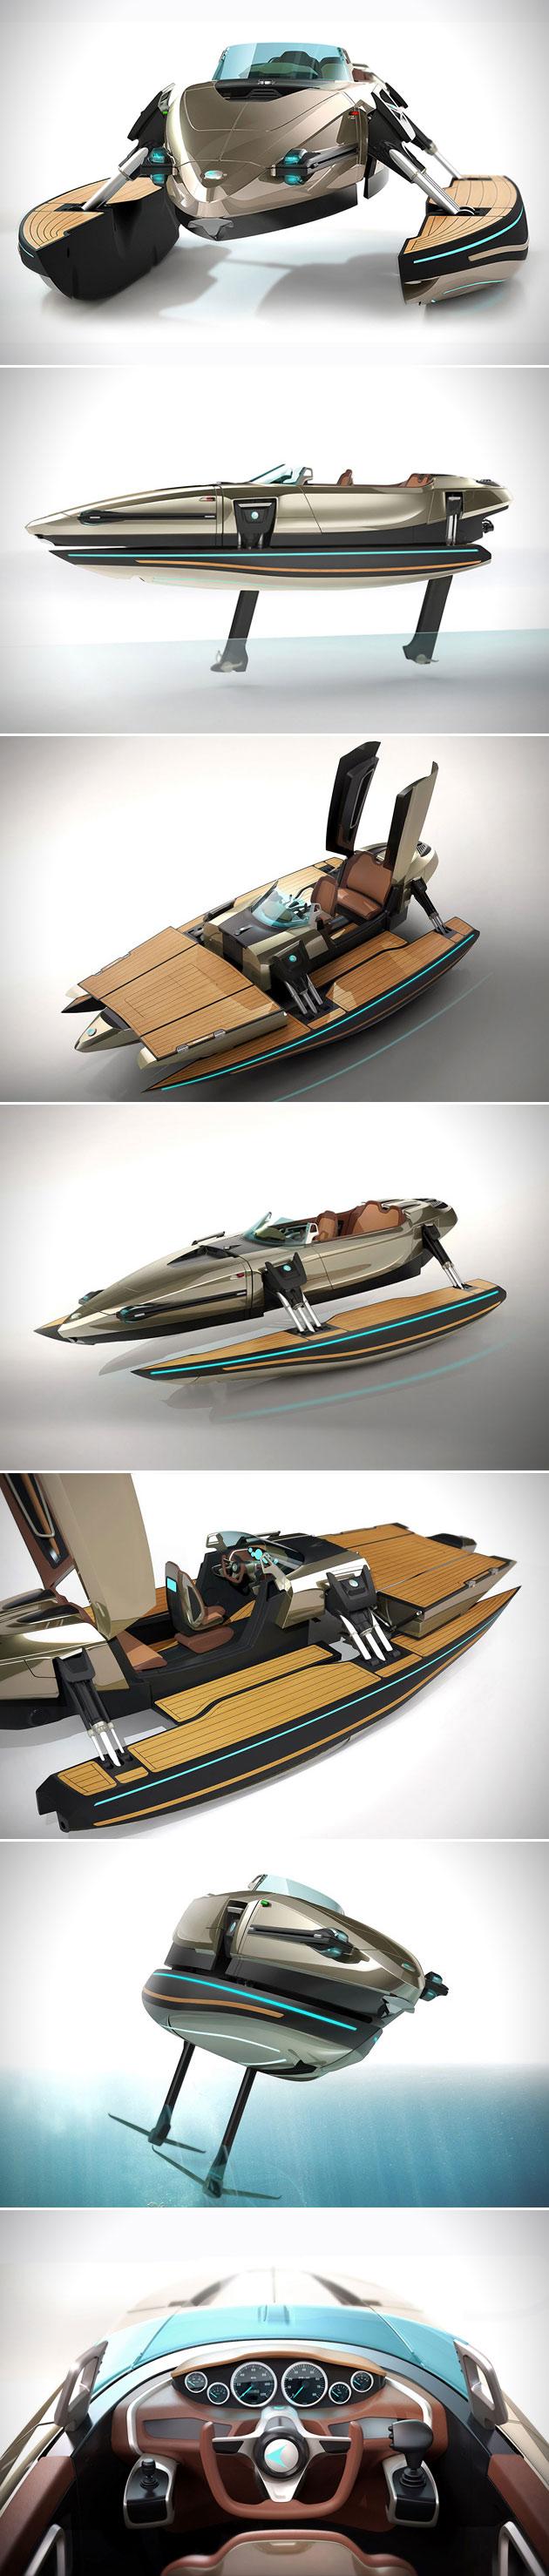 kormaran-convertible-boat-transformer